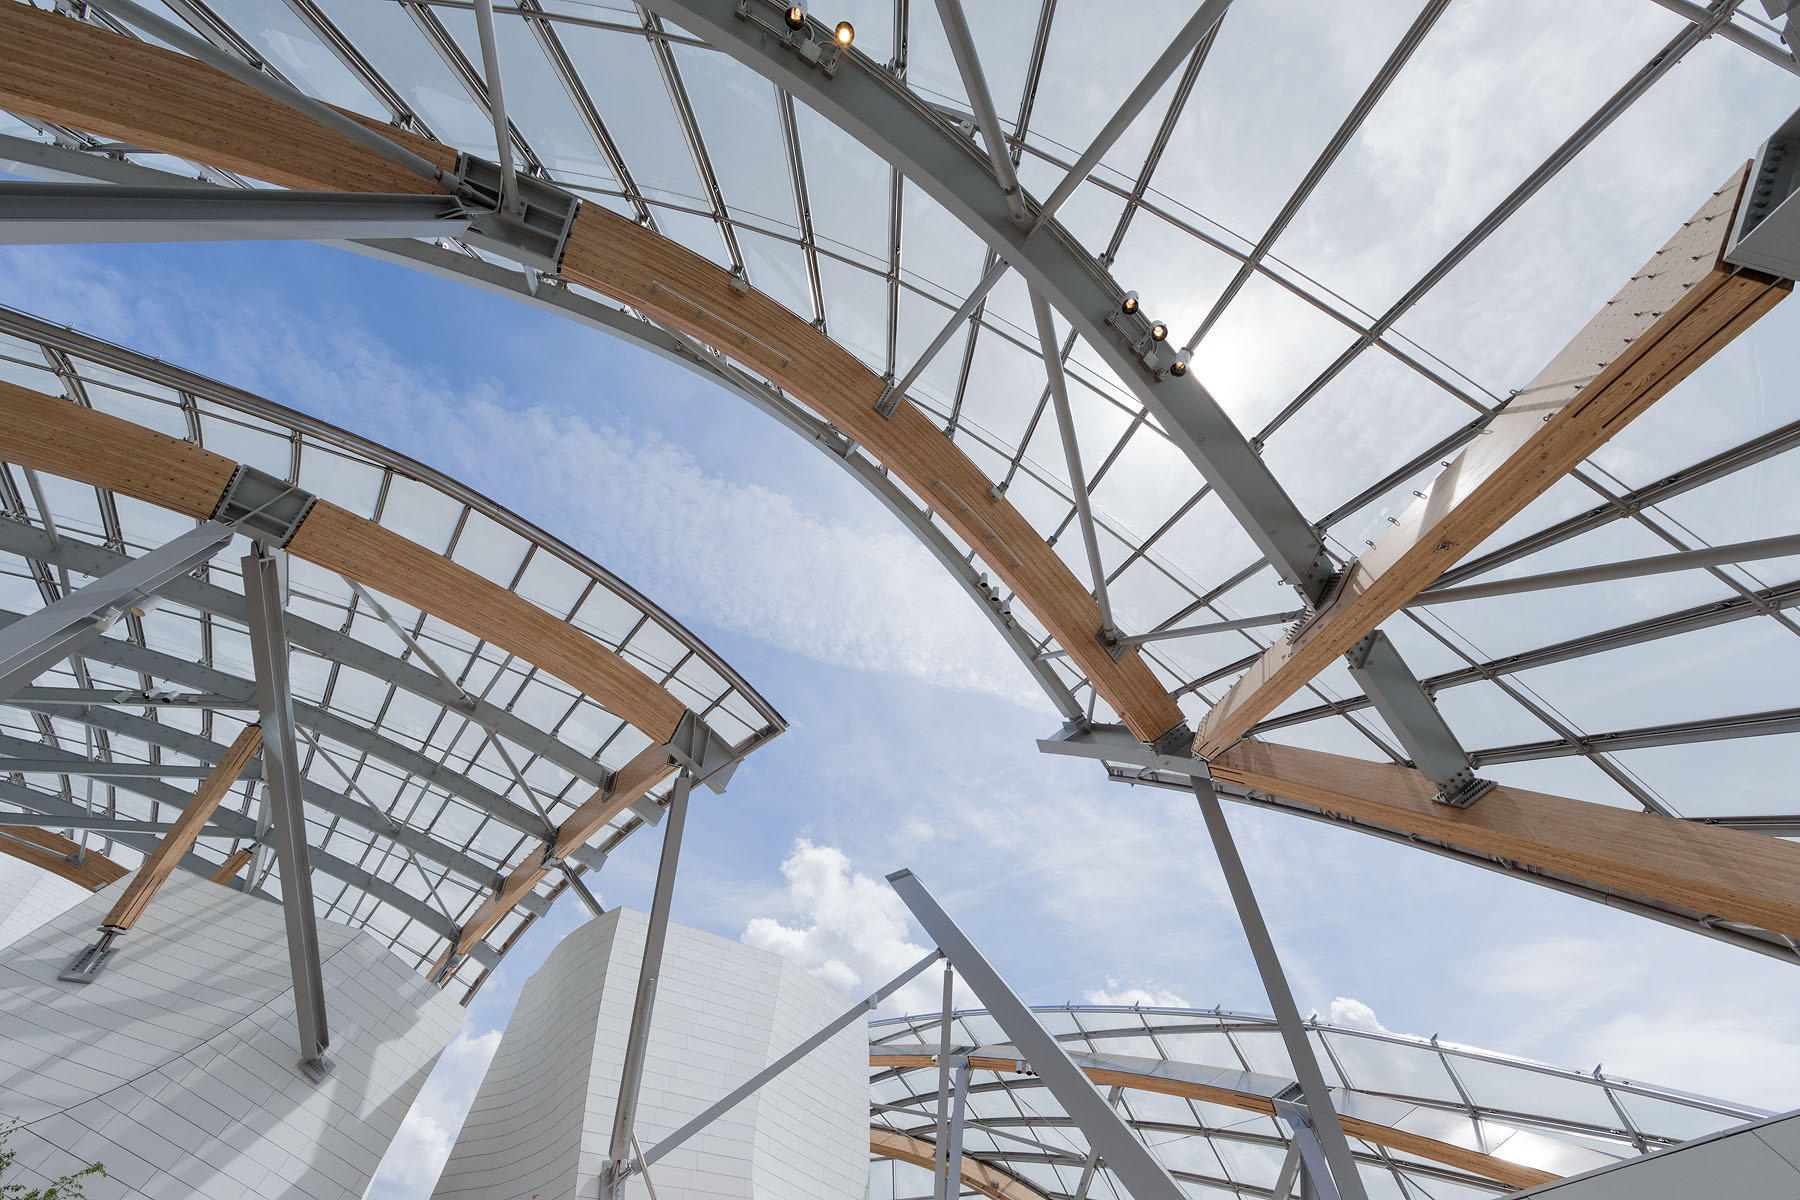 Fundación Louis Vuitton, Frank Gehry. Imagen © Iwan Baan